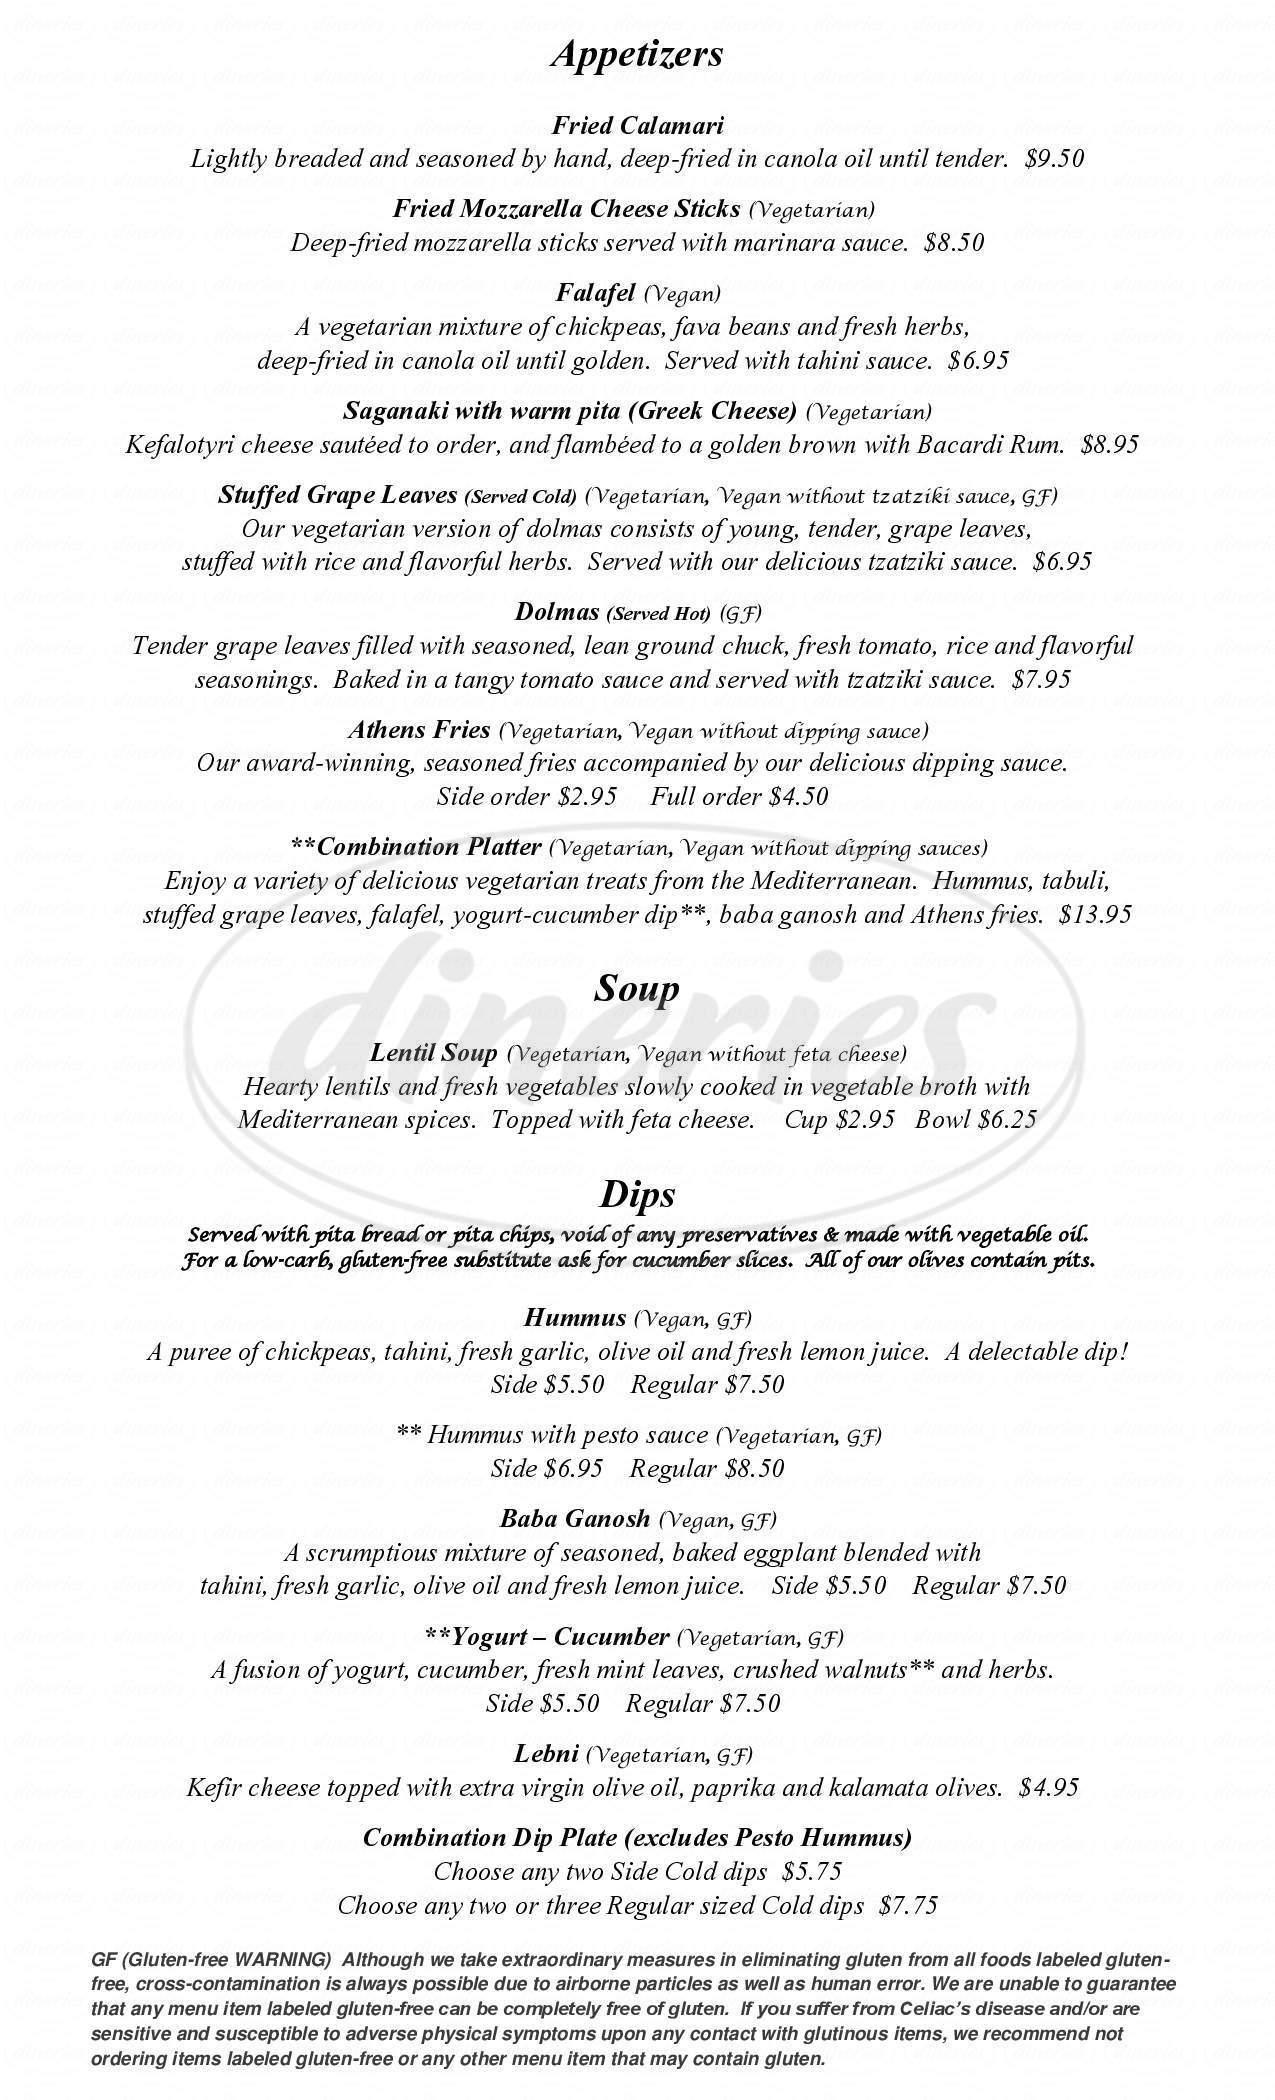 menu for Paymon's Mediterranean Cafe & Hookah Lounge